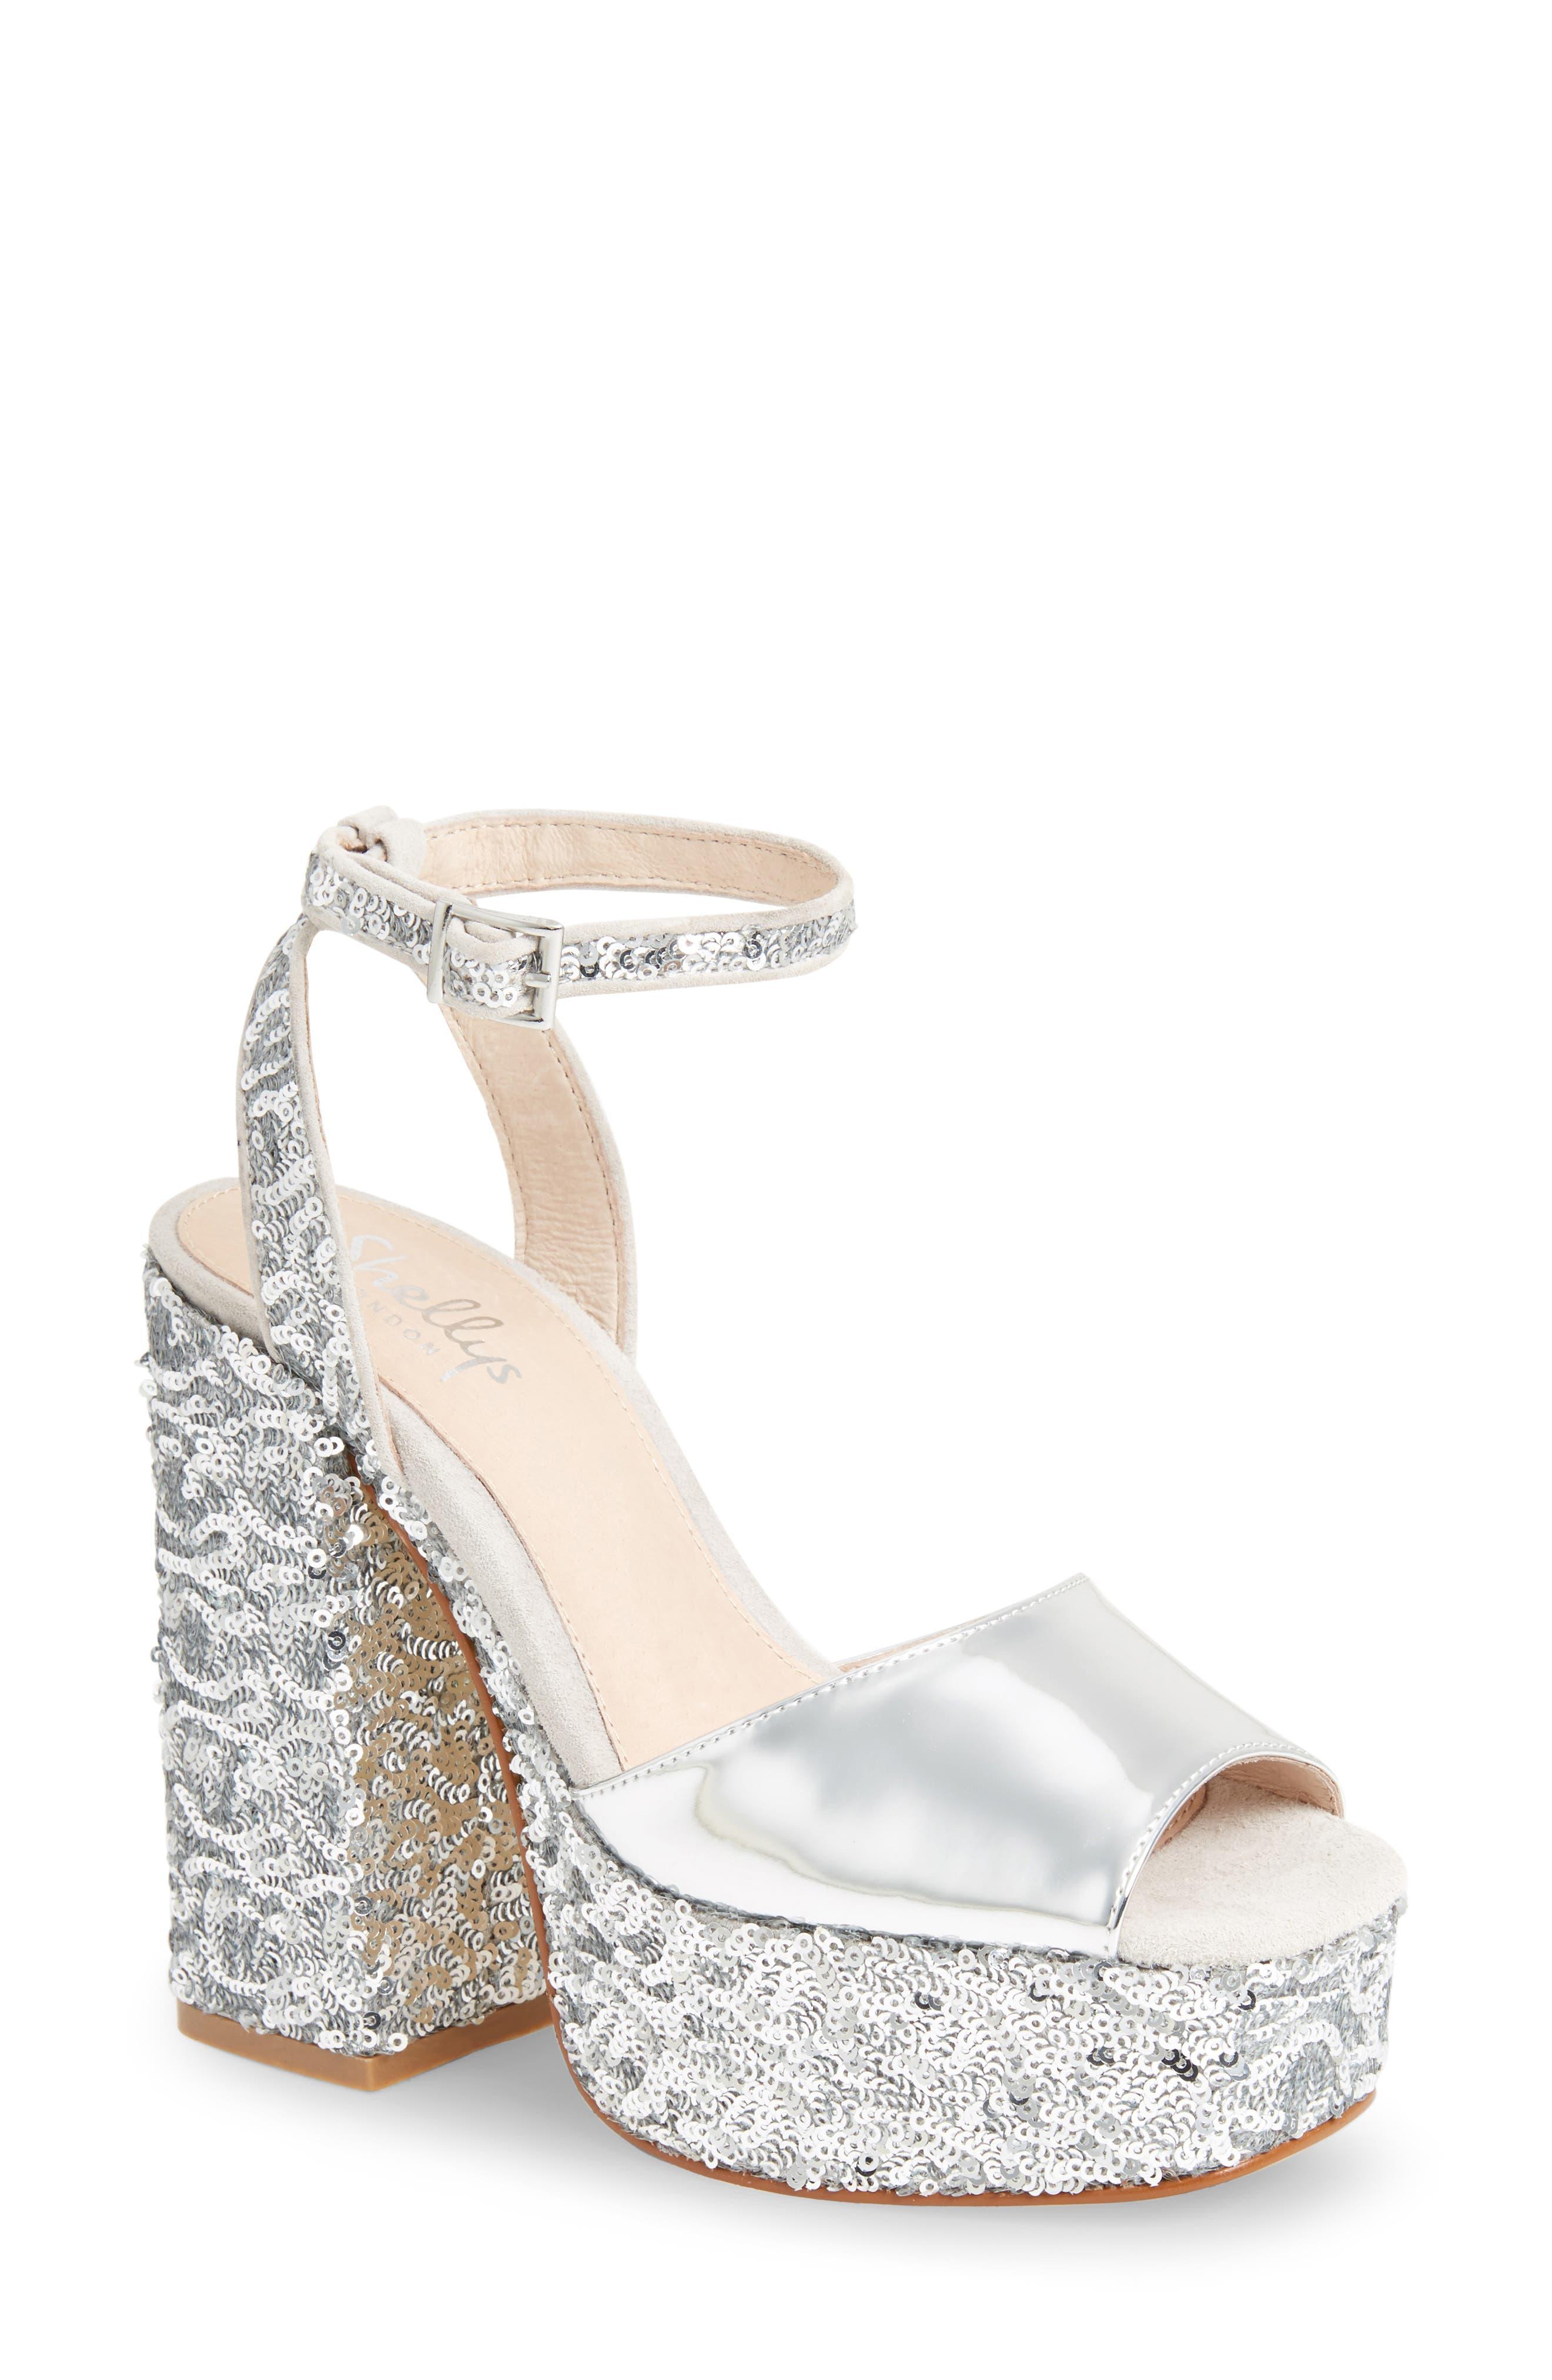 Main Image - Shellys London Dena Sequin Platform Sandal (Women)